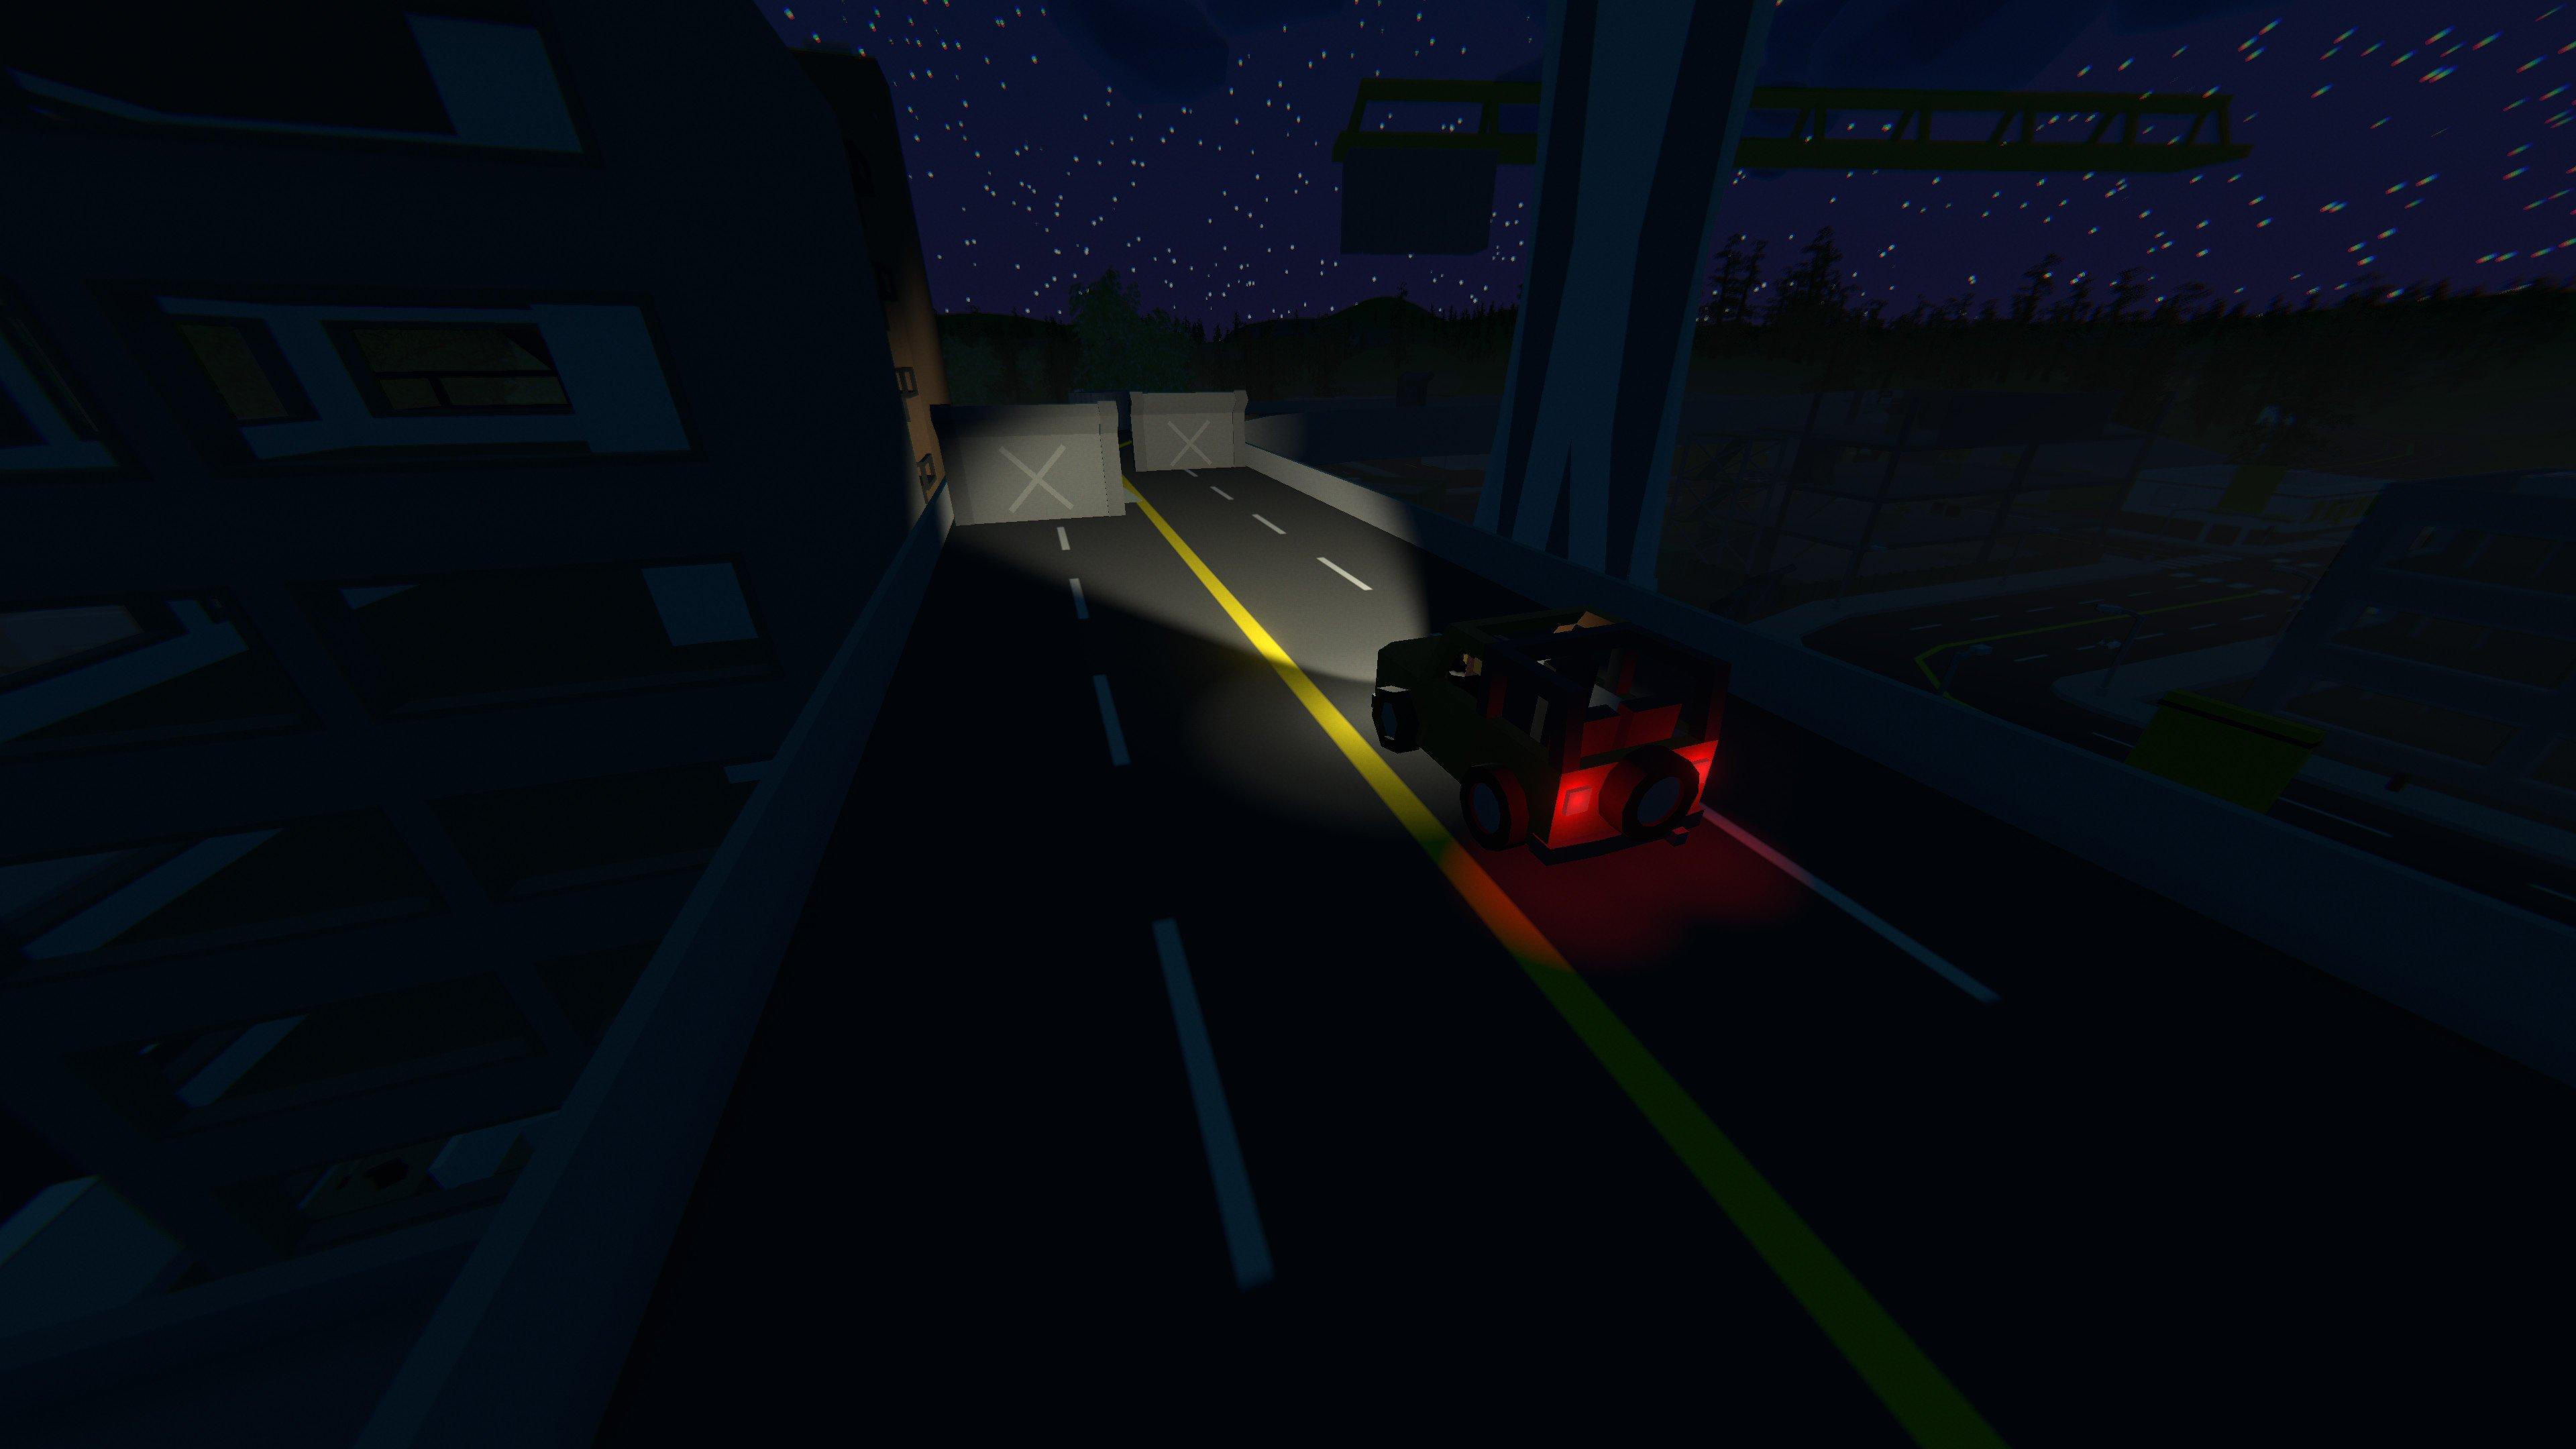 5-gier-podobnych-do-minecraft-unturned-3.jpg